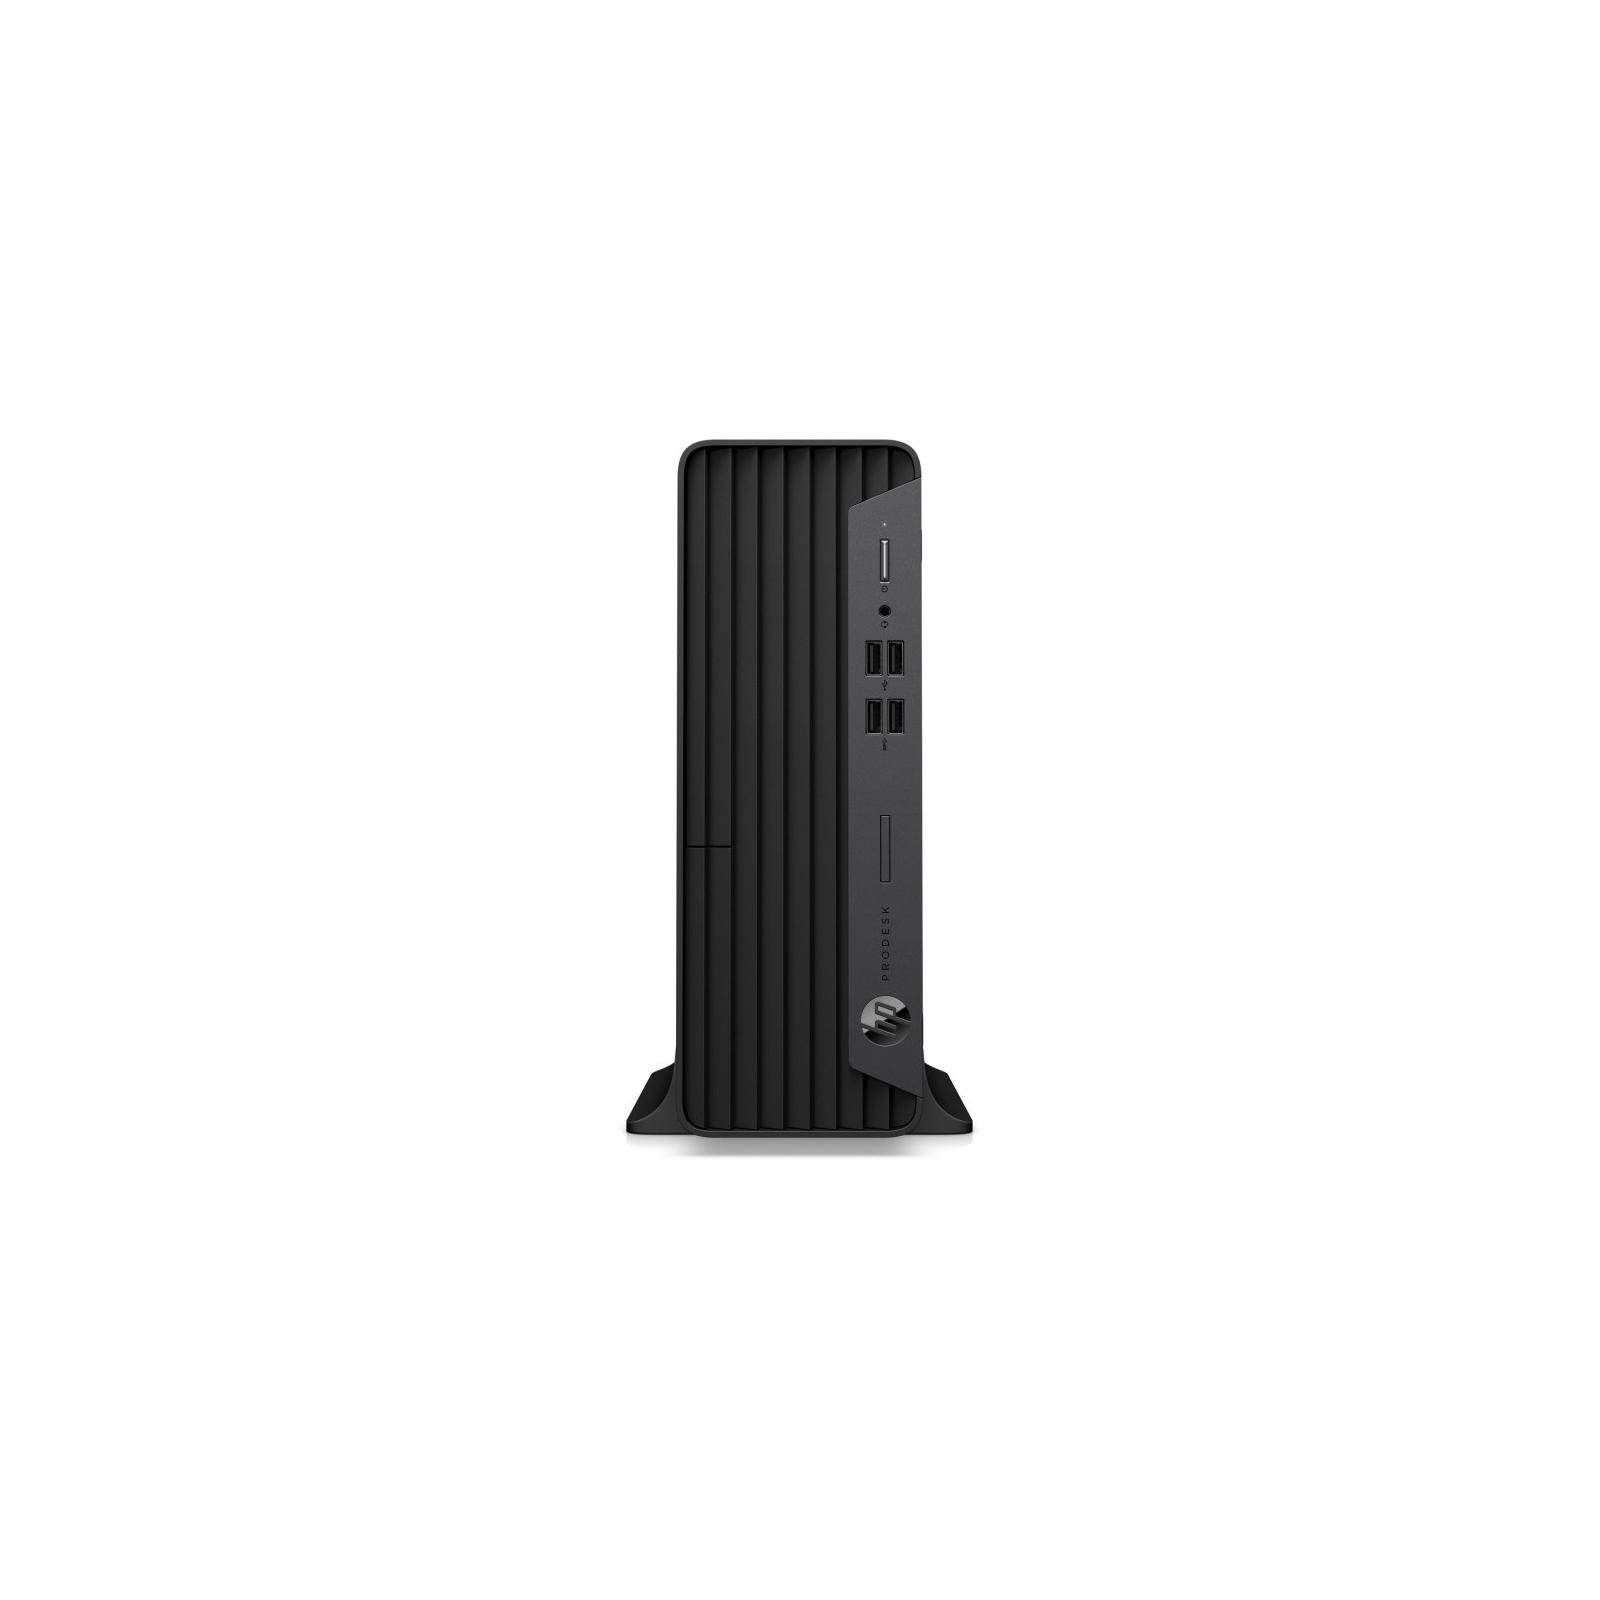 Компьютер HP ProDesk 400 G7 SFF / i3-10100 (293Z3EA) изображение 4